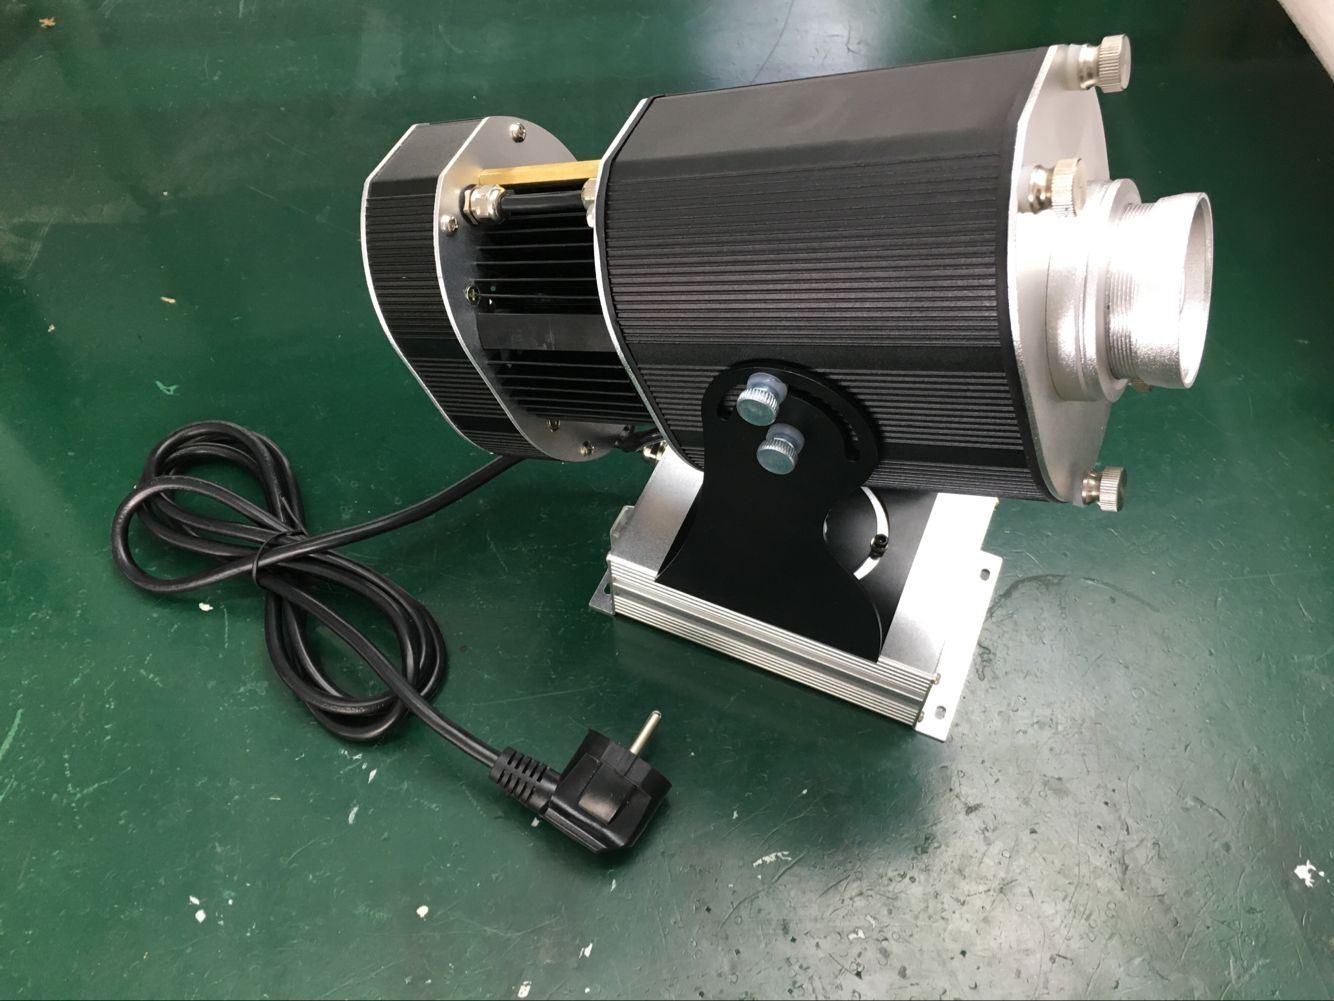 80W 10000 Lumens Single Static Indoor Gobo Projector for Wedding